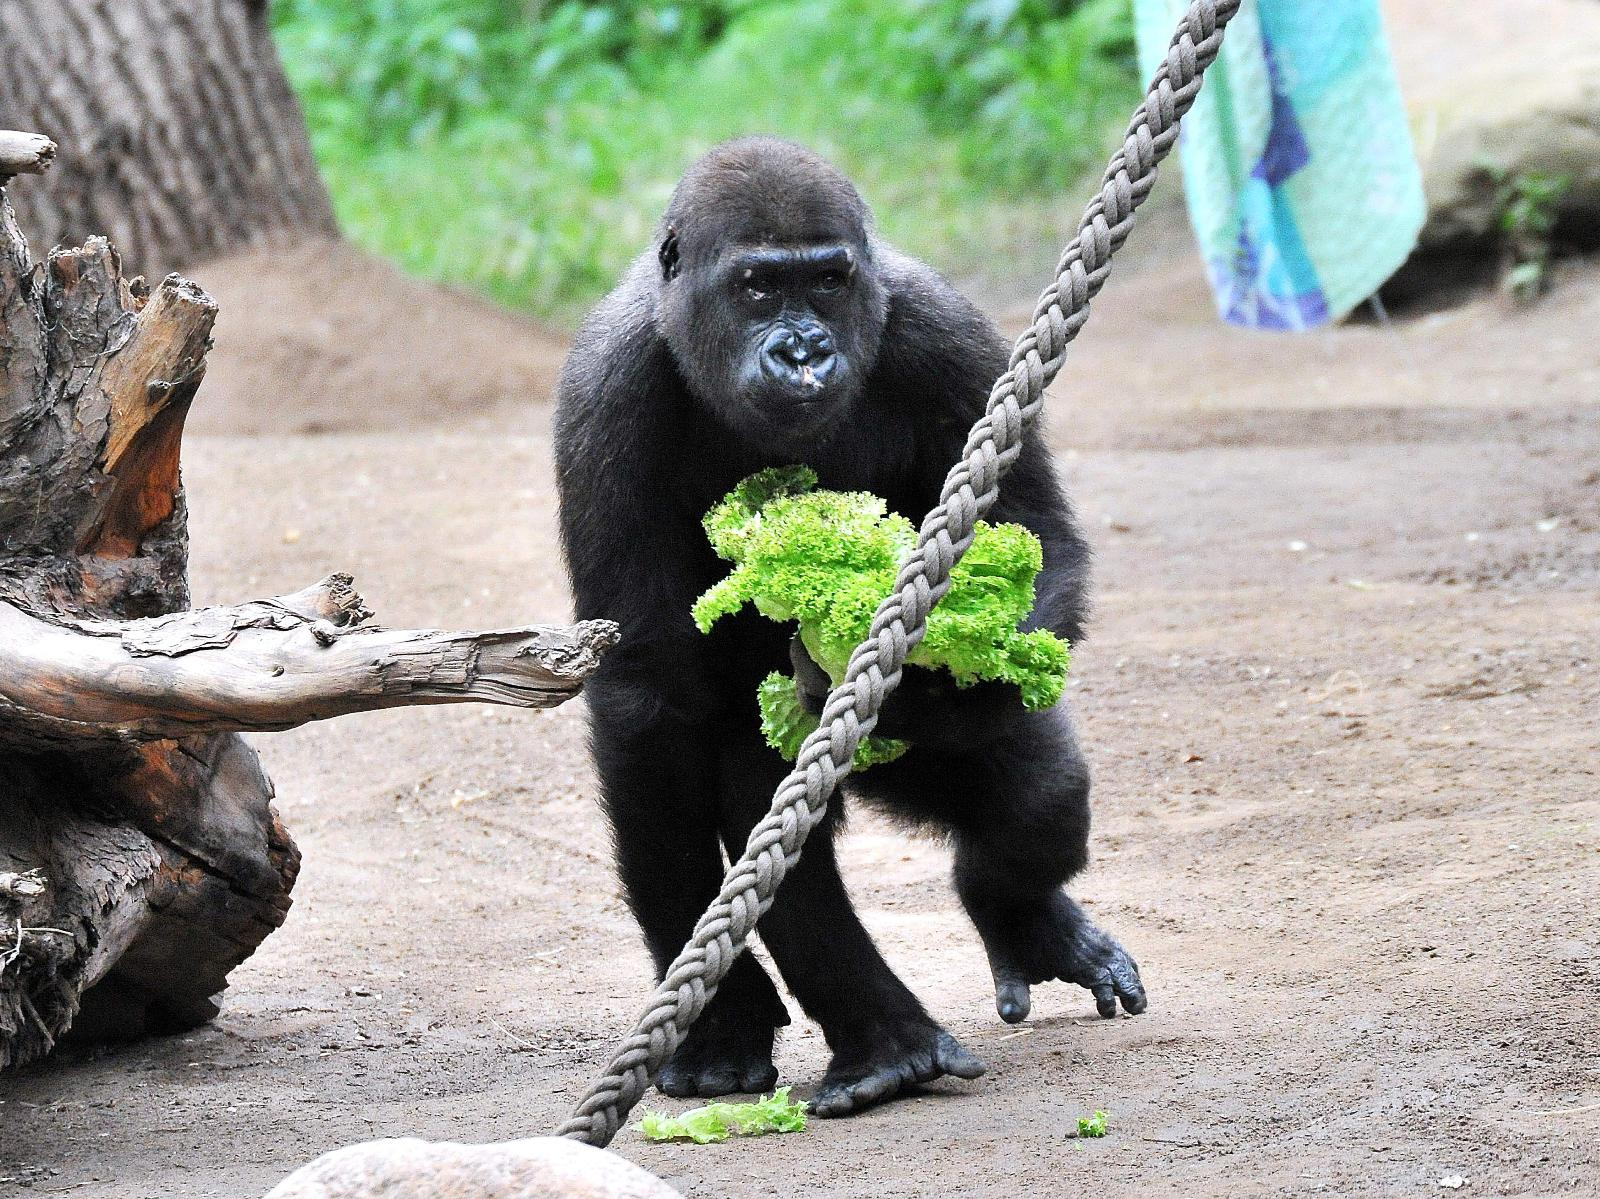 Gorilla Kwame